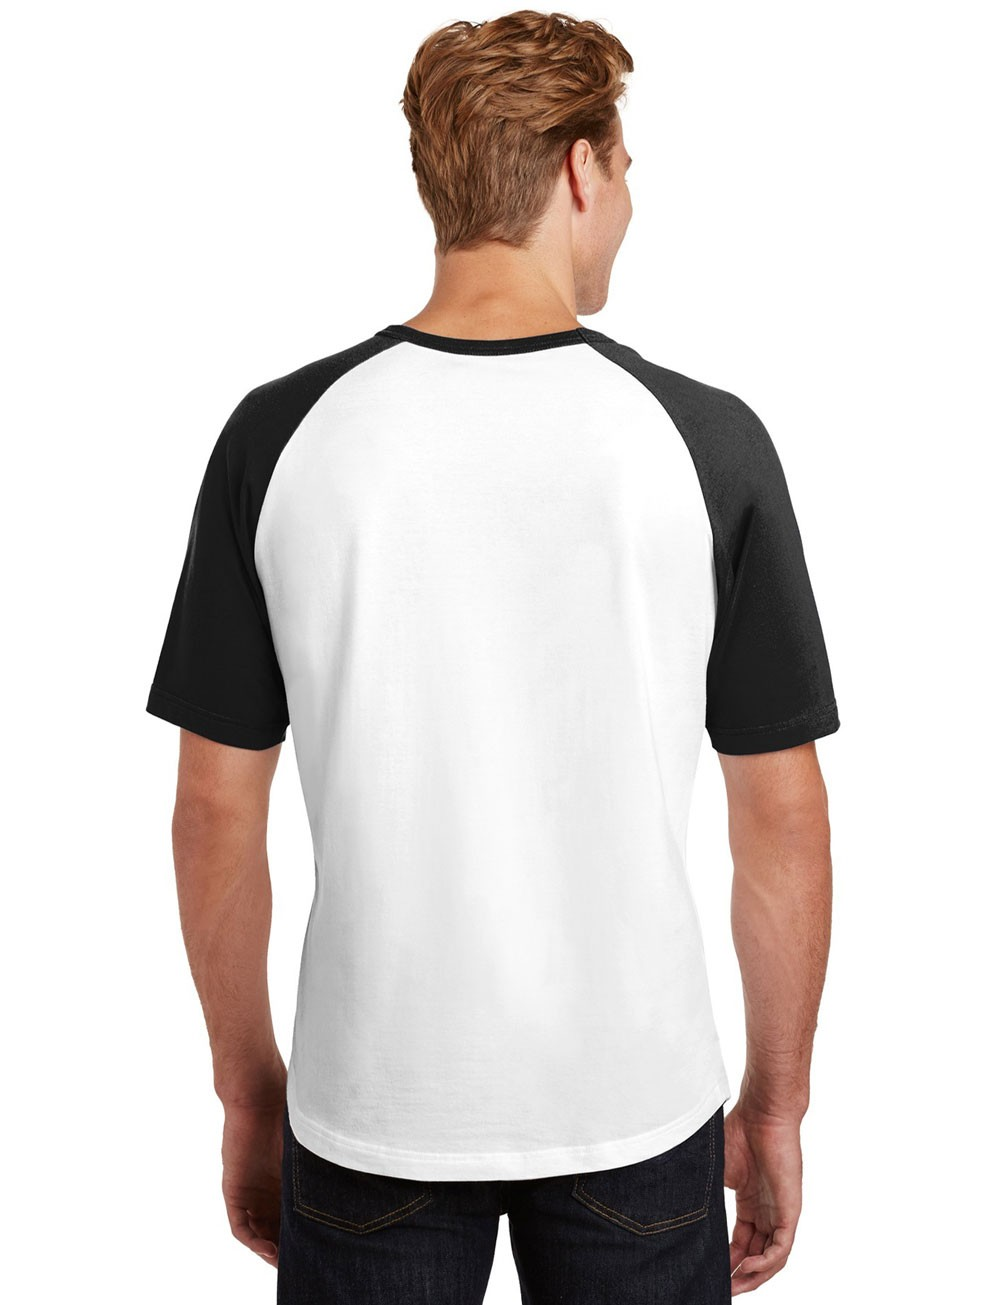 Camiseta Raglan Masculina Academia Malhação ES_203